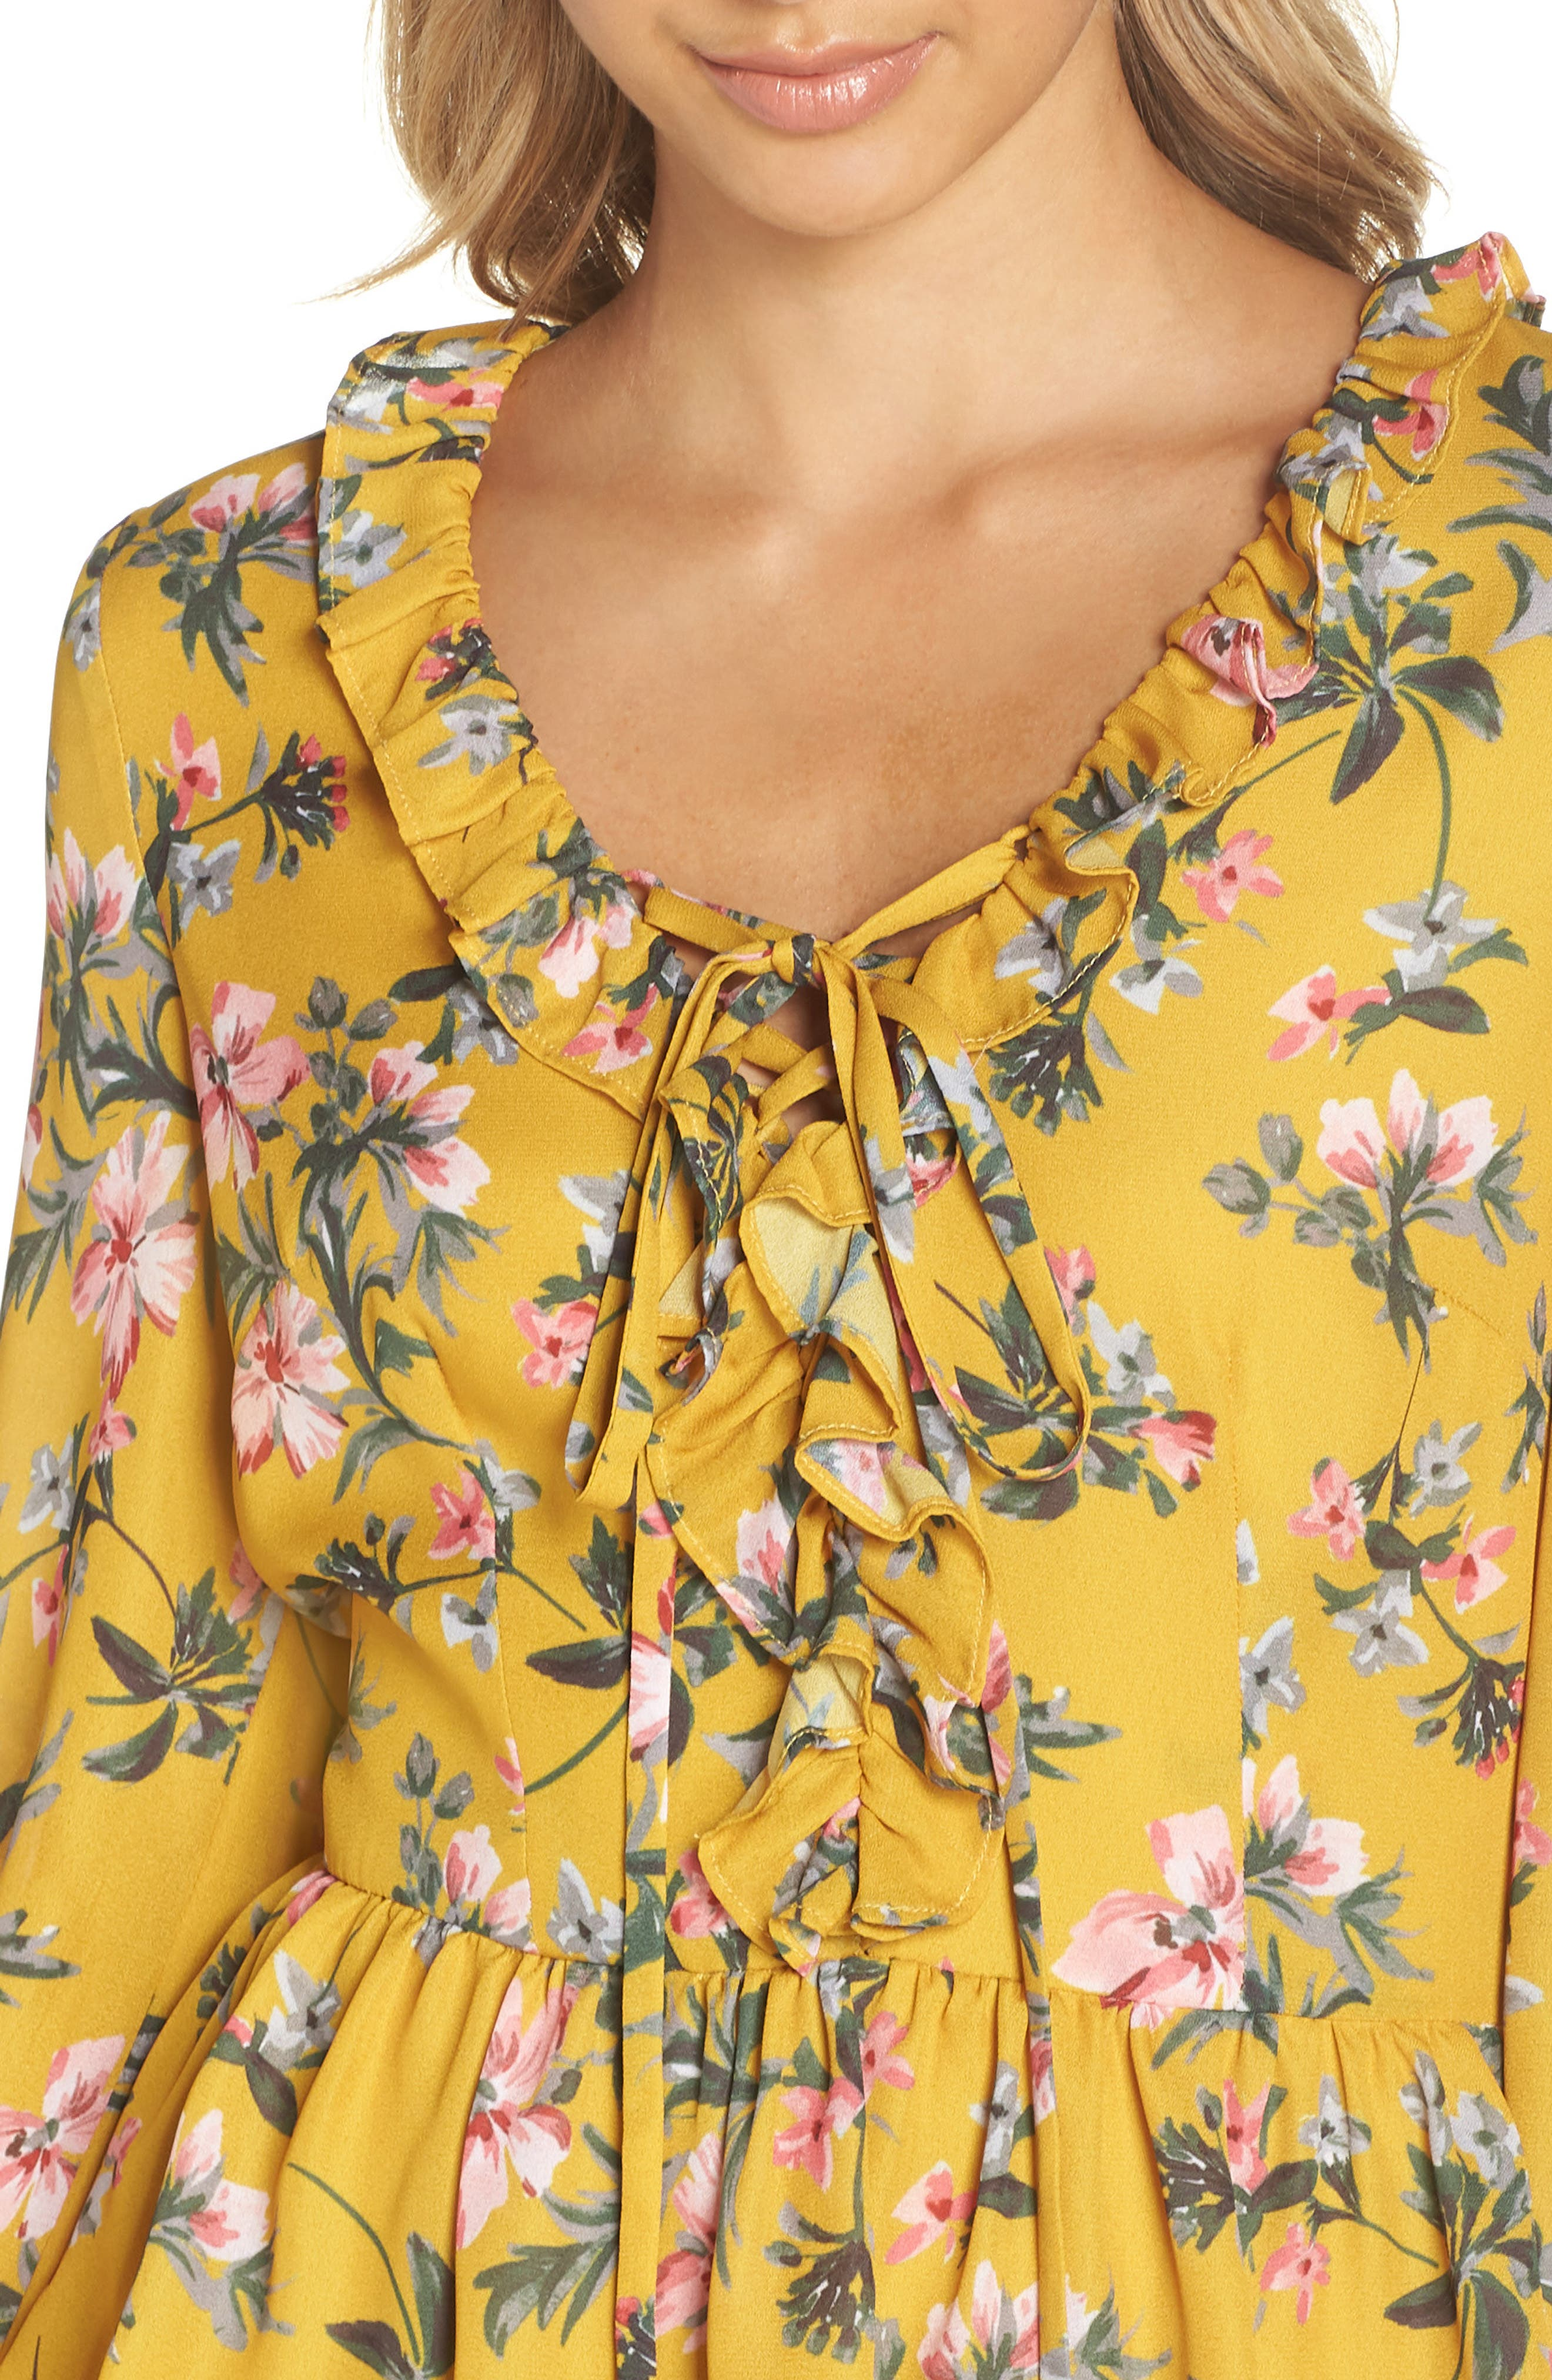 Floral Ruffle Dress,                             Alternate thumbnail 4, color,                             MARIGOLD MULTI